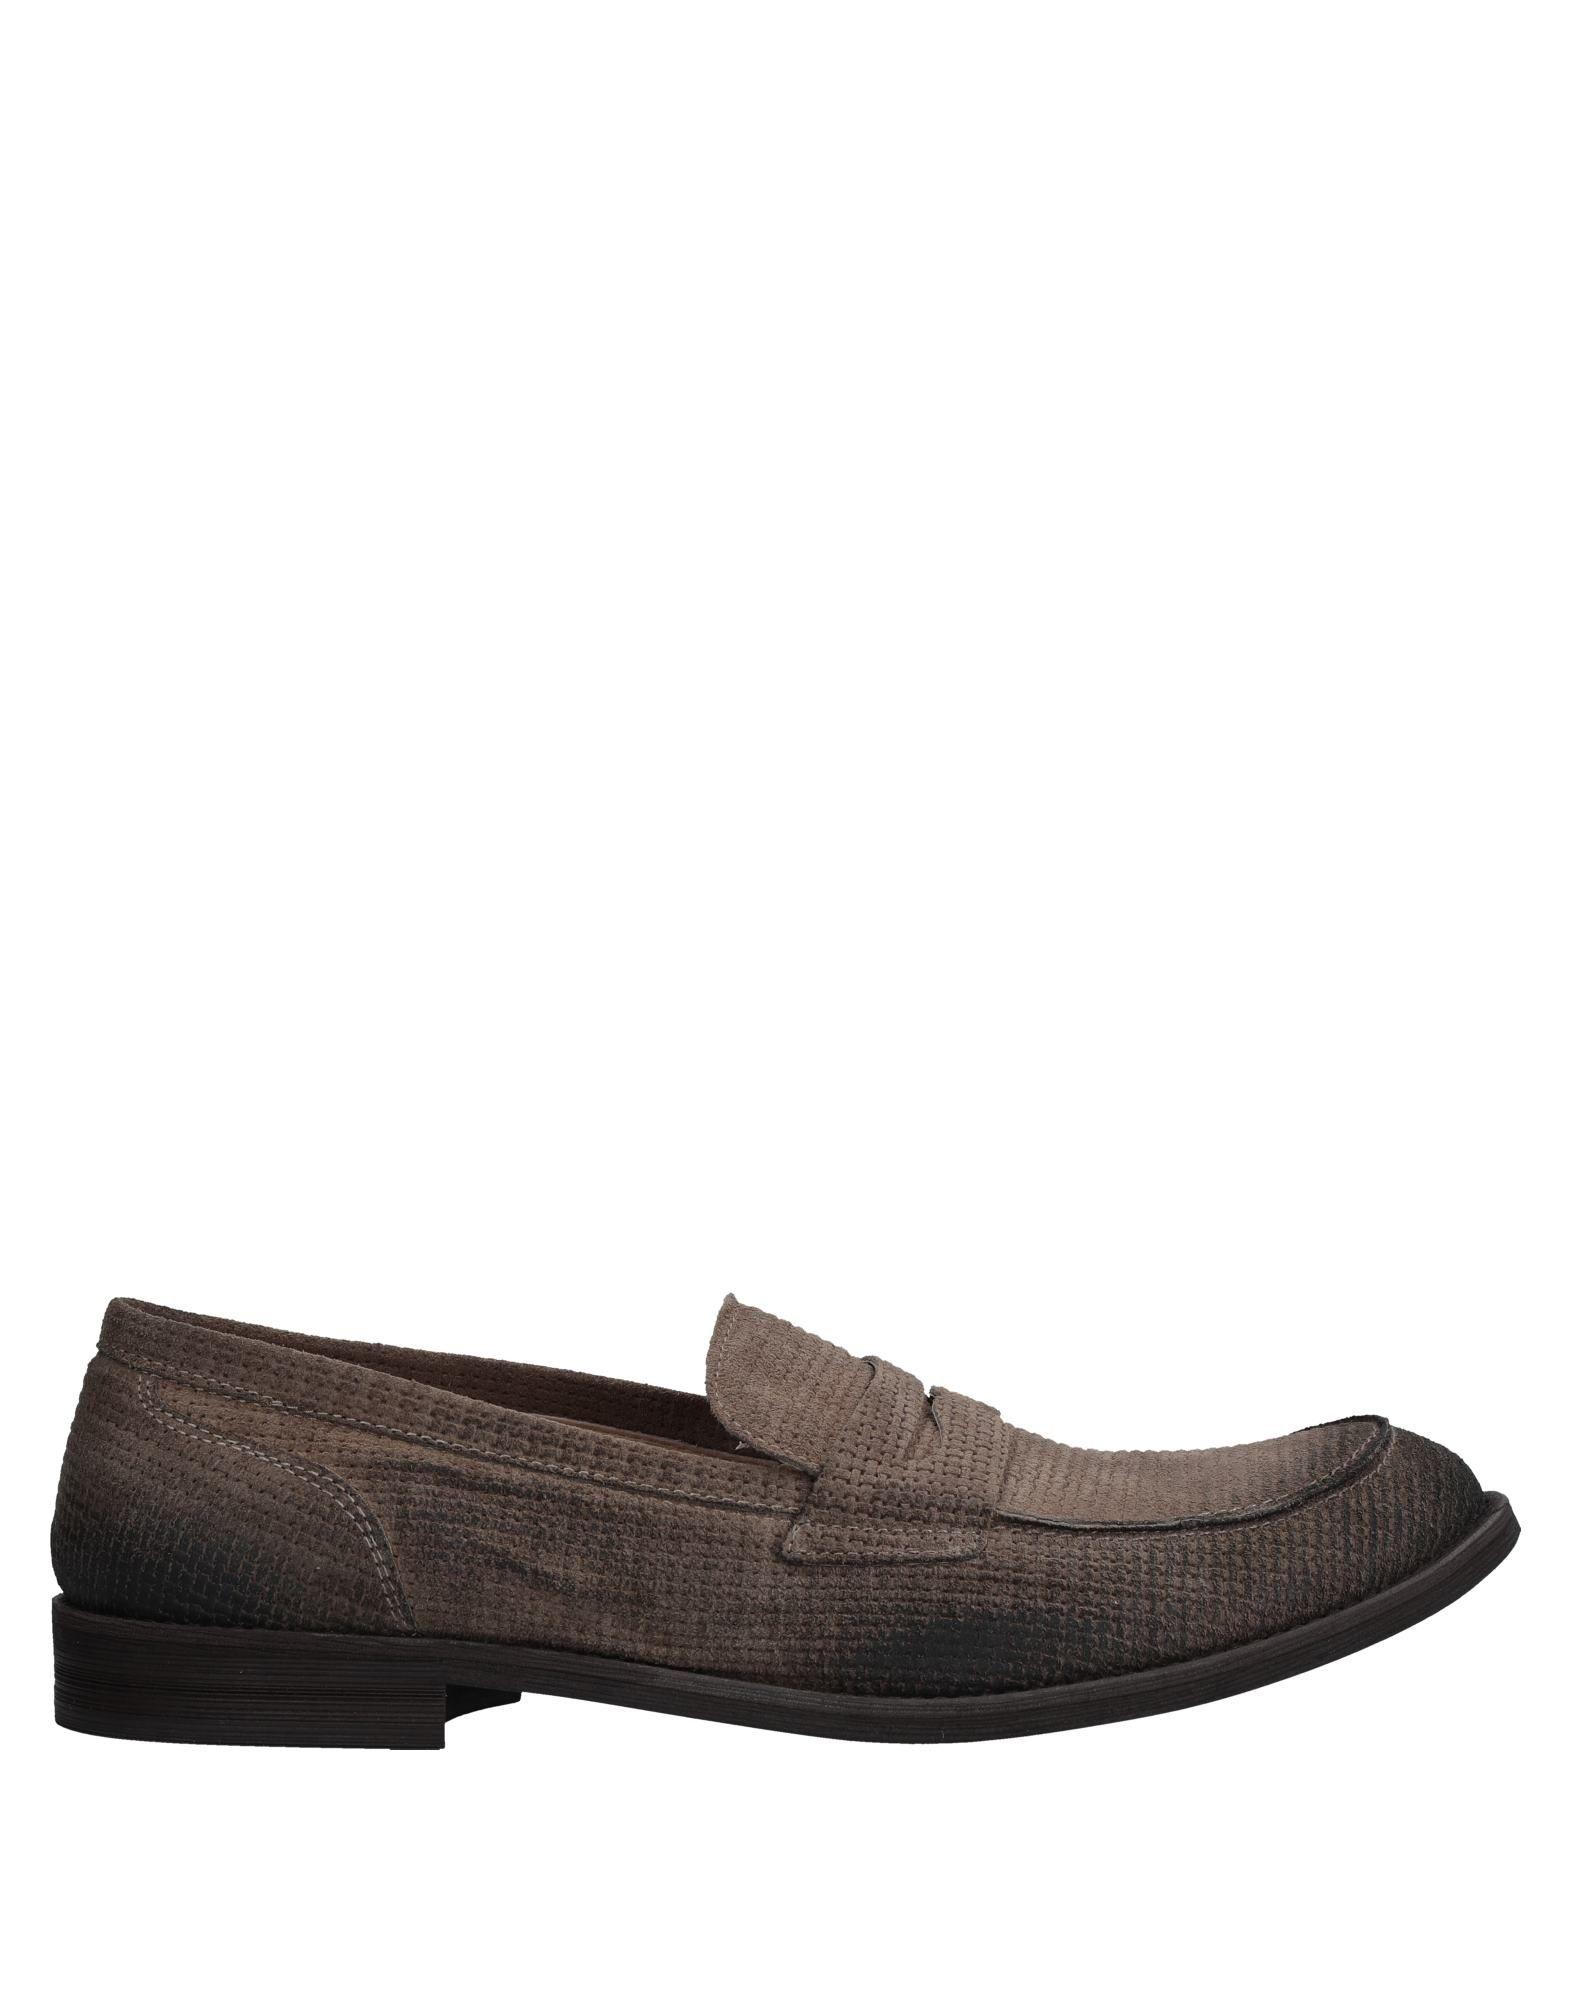 Rabatt echte Schuhe Officina 11540548SU 36 Mokassins Herren  11540548SU Officina b8dc74